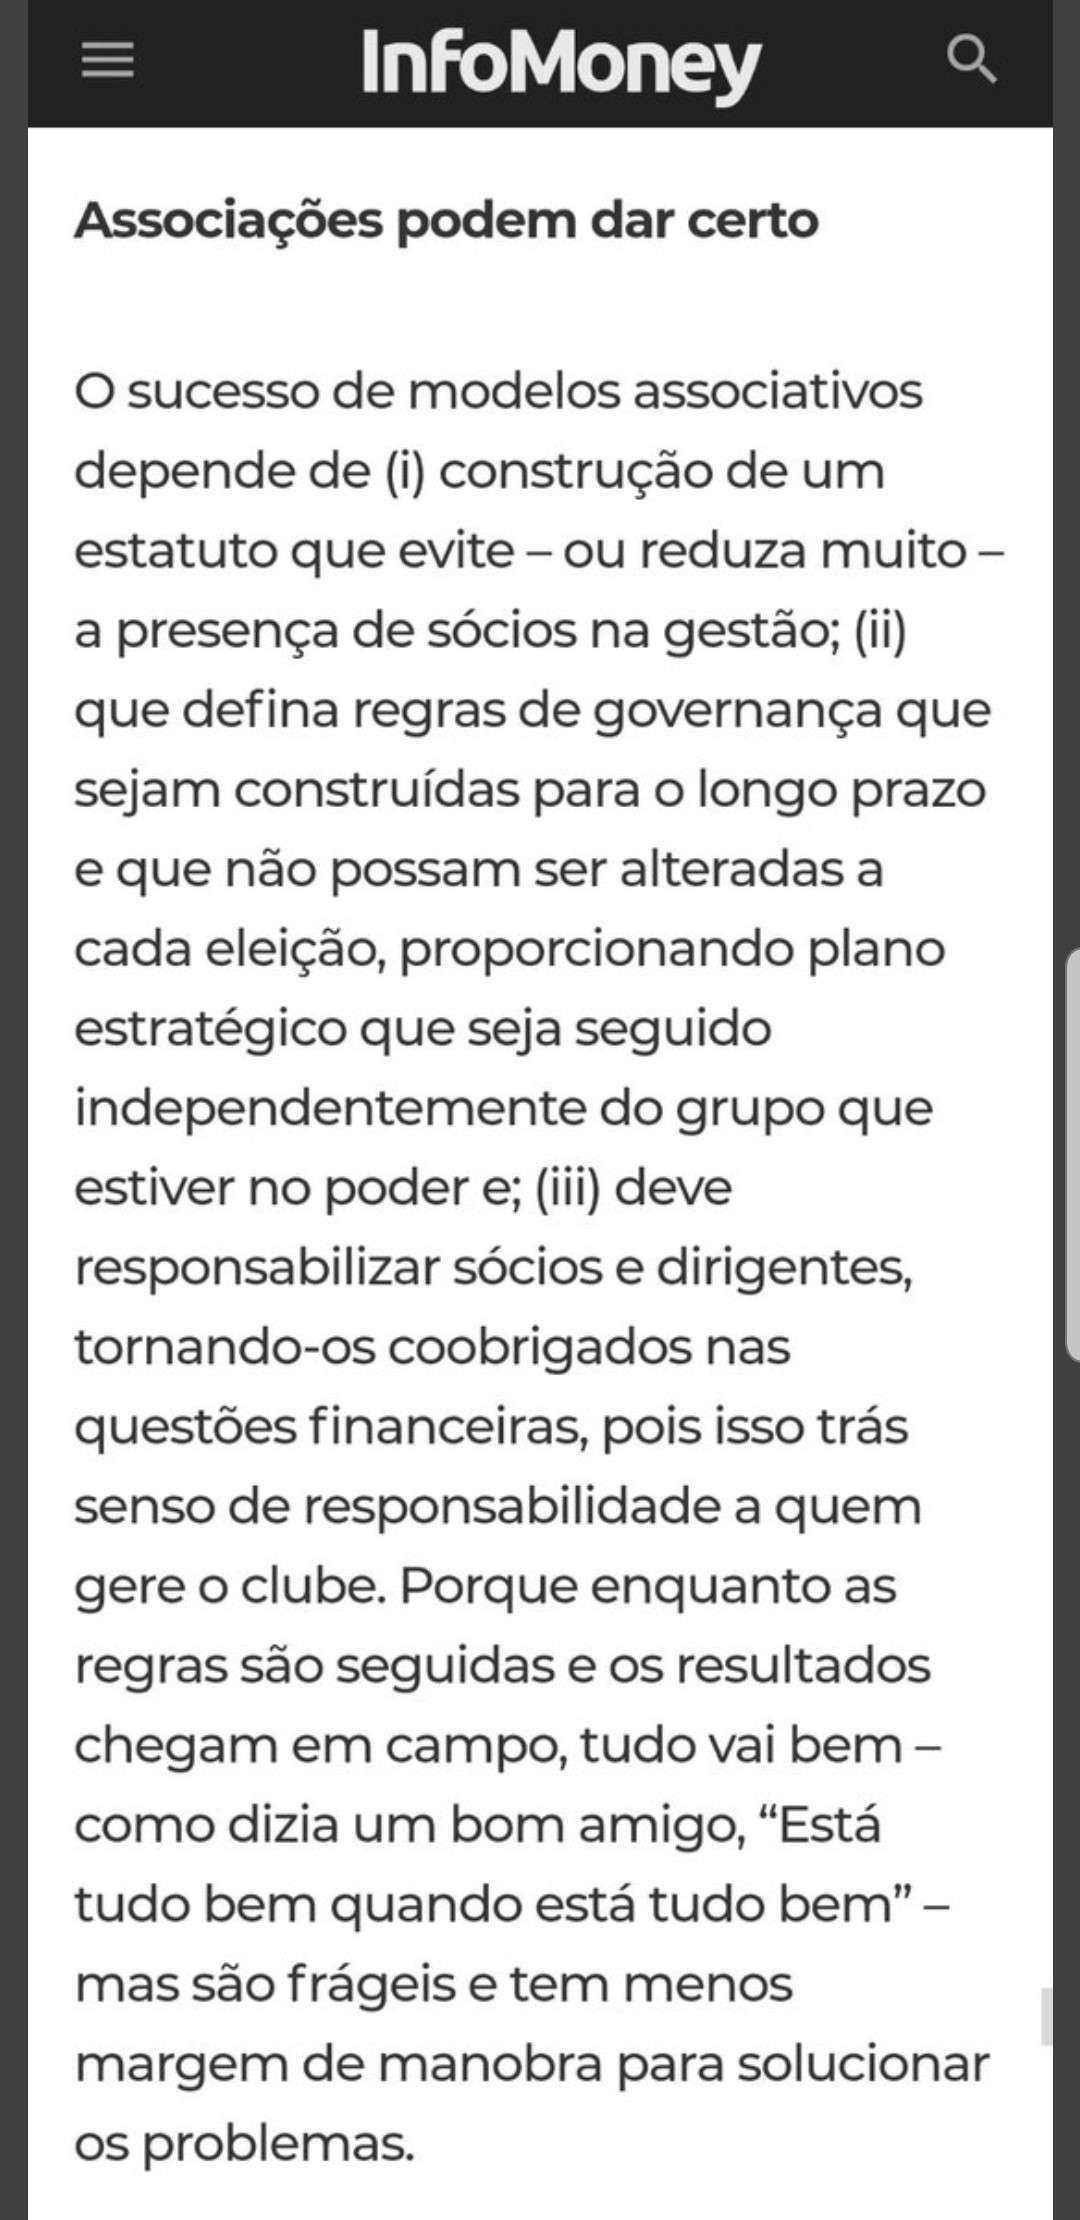 https://www.infomoney.com.br/